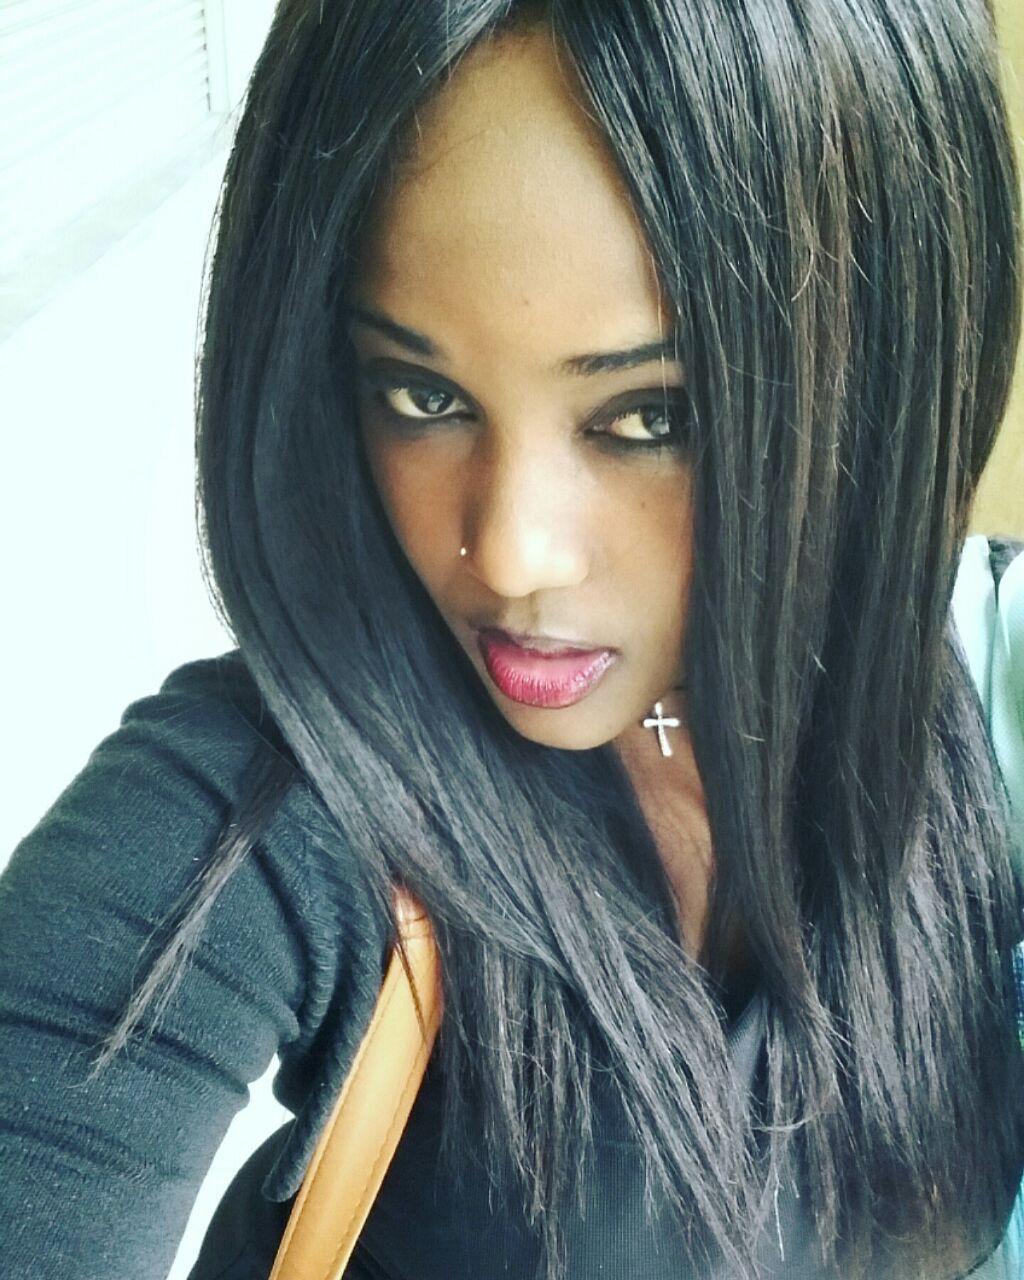 Sharon Siya, sharing the love of God through music | Urban